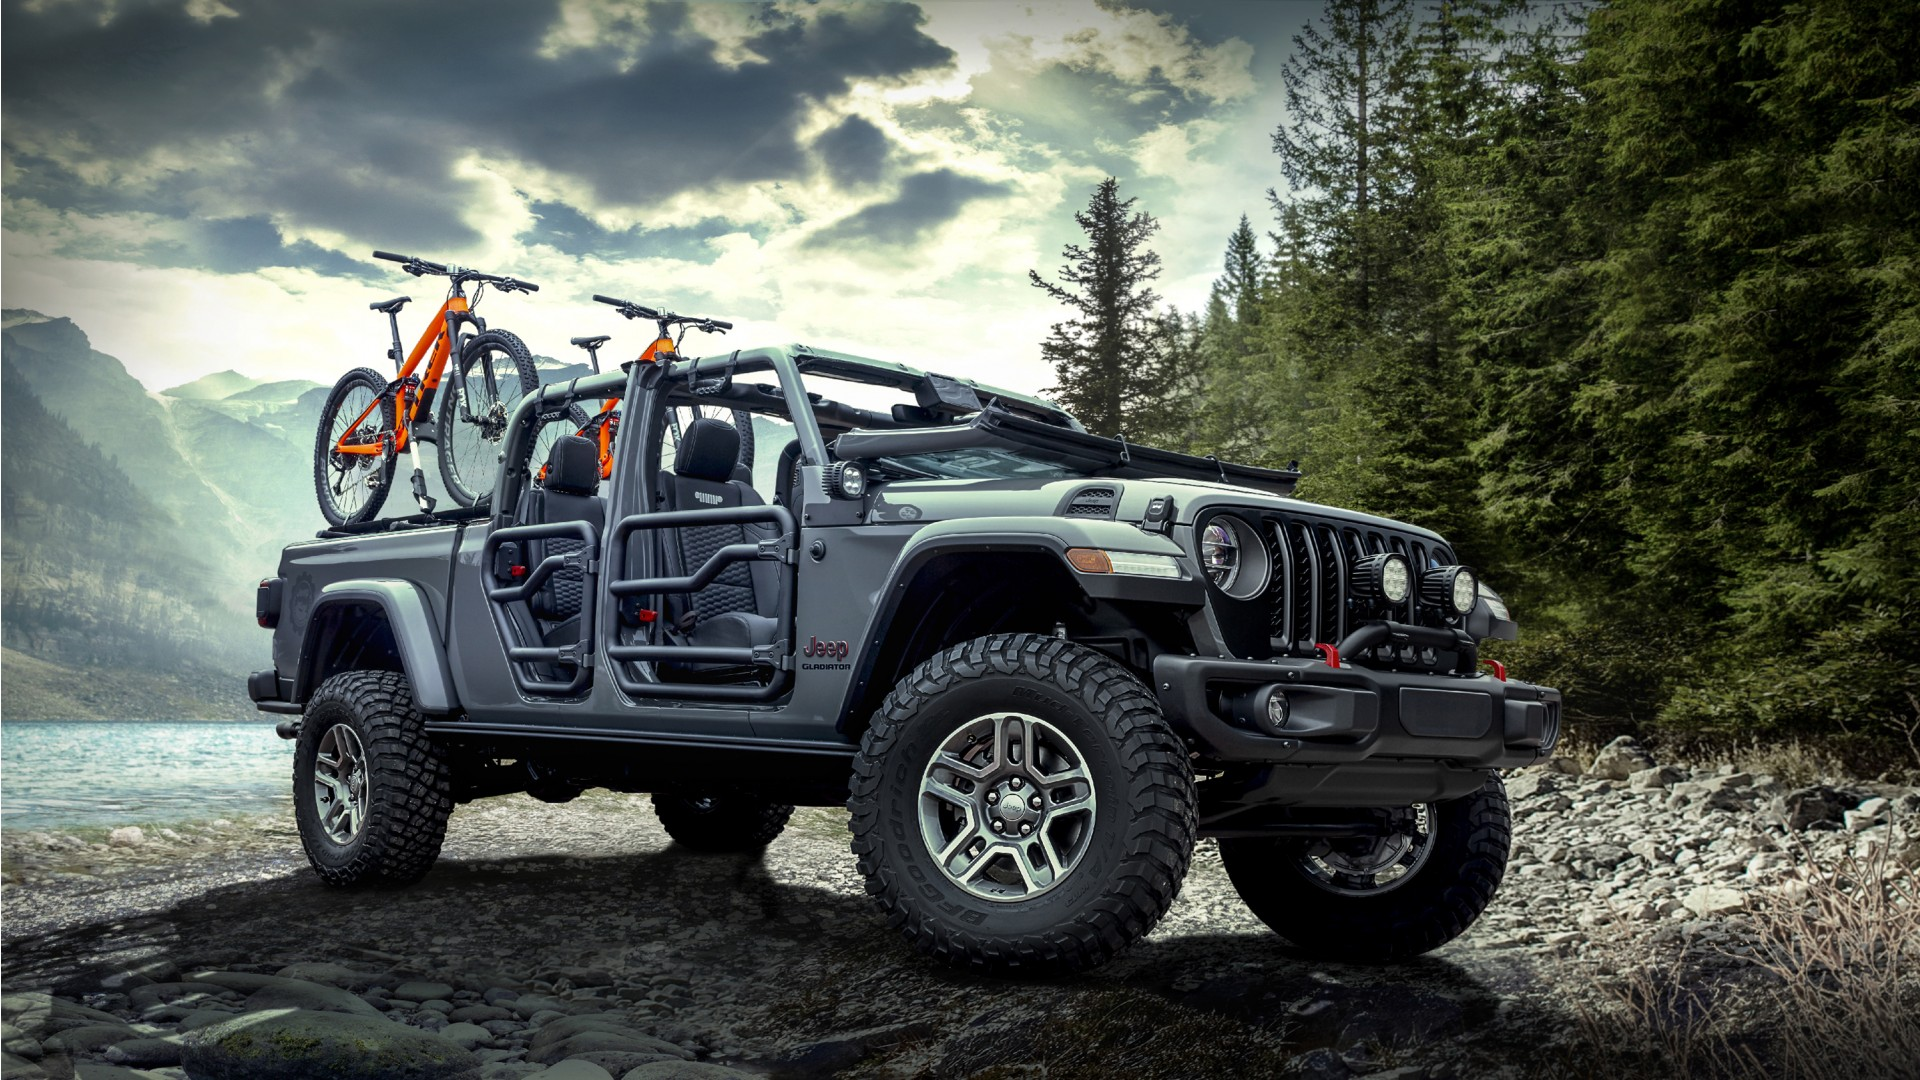 Jeep Wrangler Renegade >> 2020 Mopar Jeep Gladiator Rubicon Wallpaper | HD Car ...